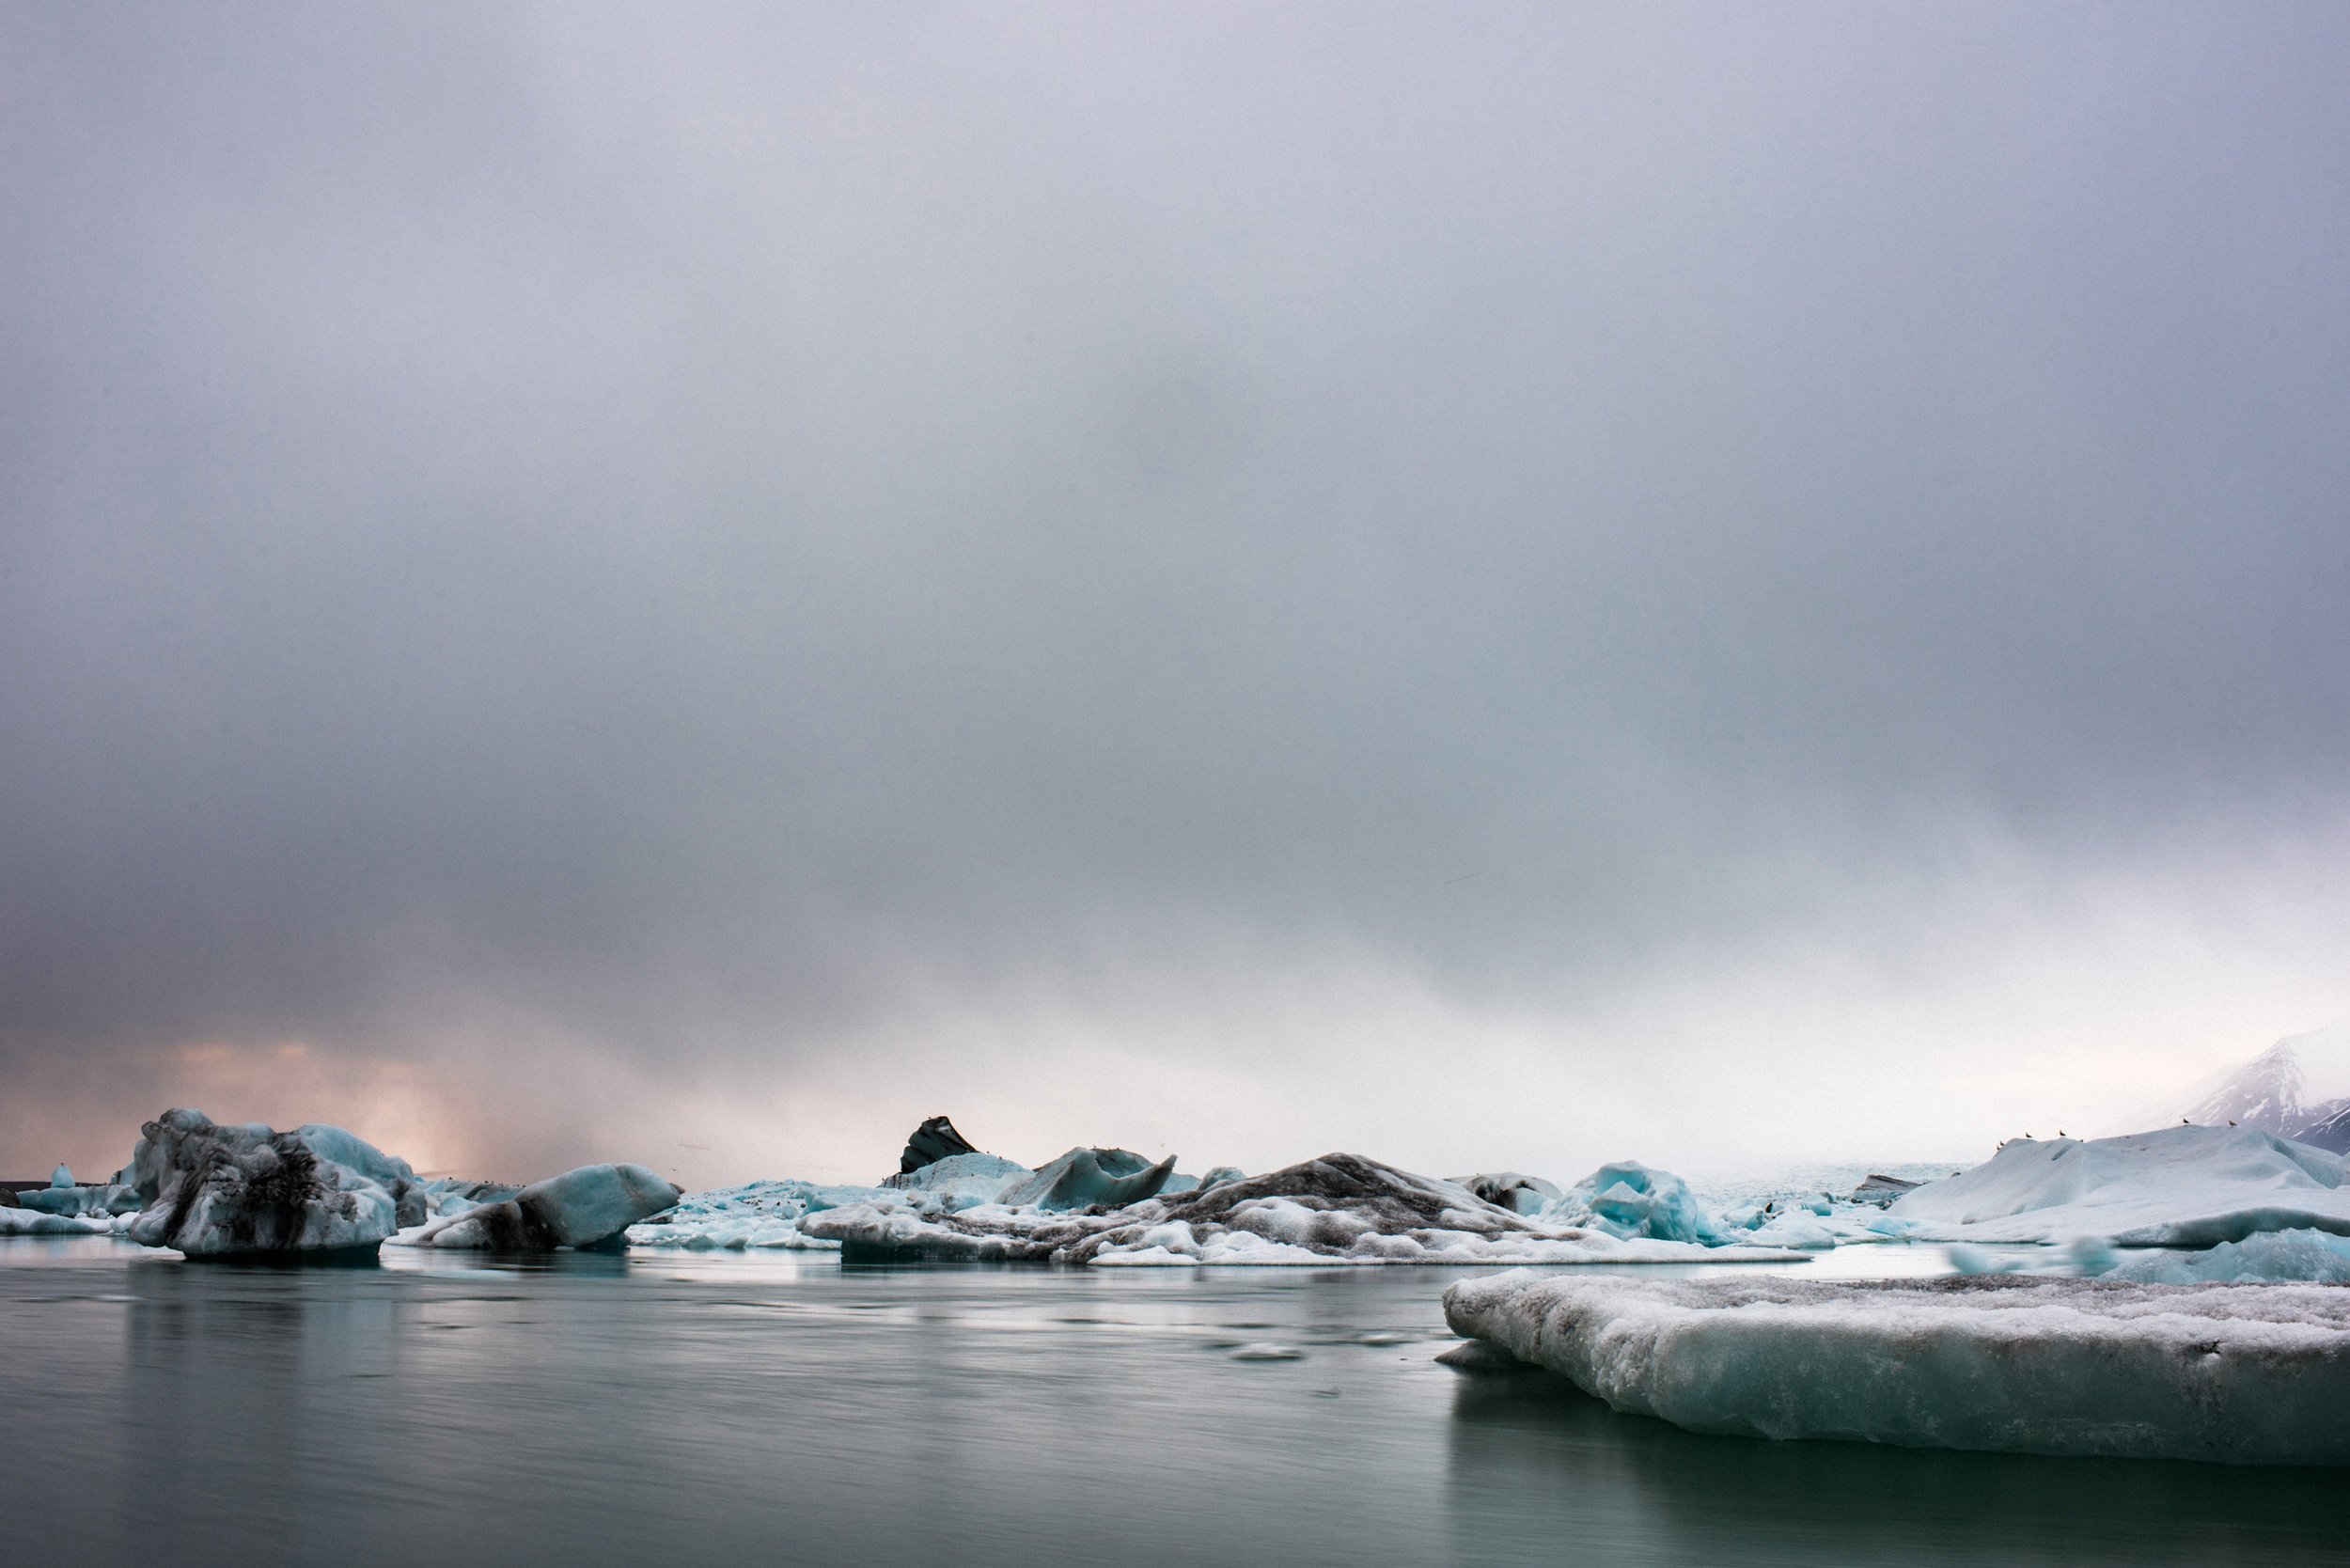 ICELAND_WOMAN_PHOTOGRAPHER_TARASHUPE_OUTDOOR_PHOTOGRAPHY_085.jpg